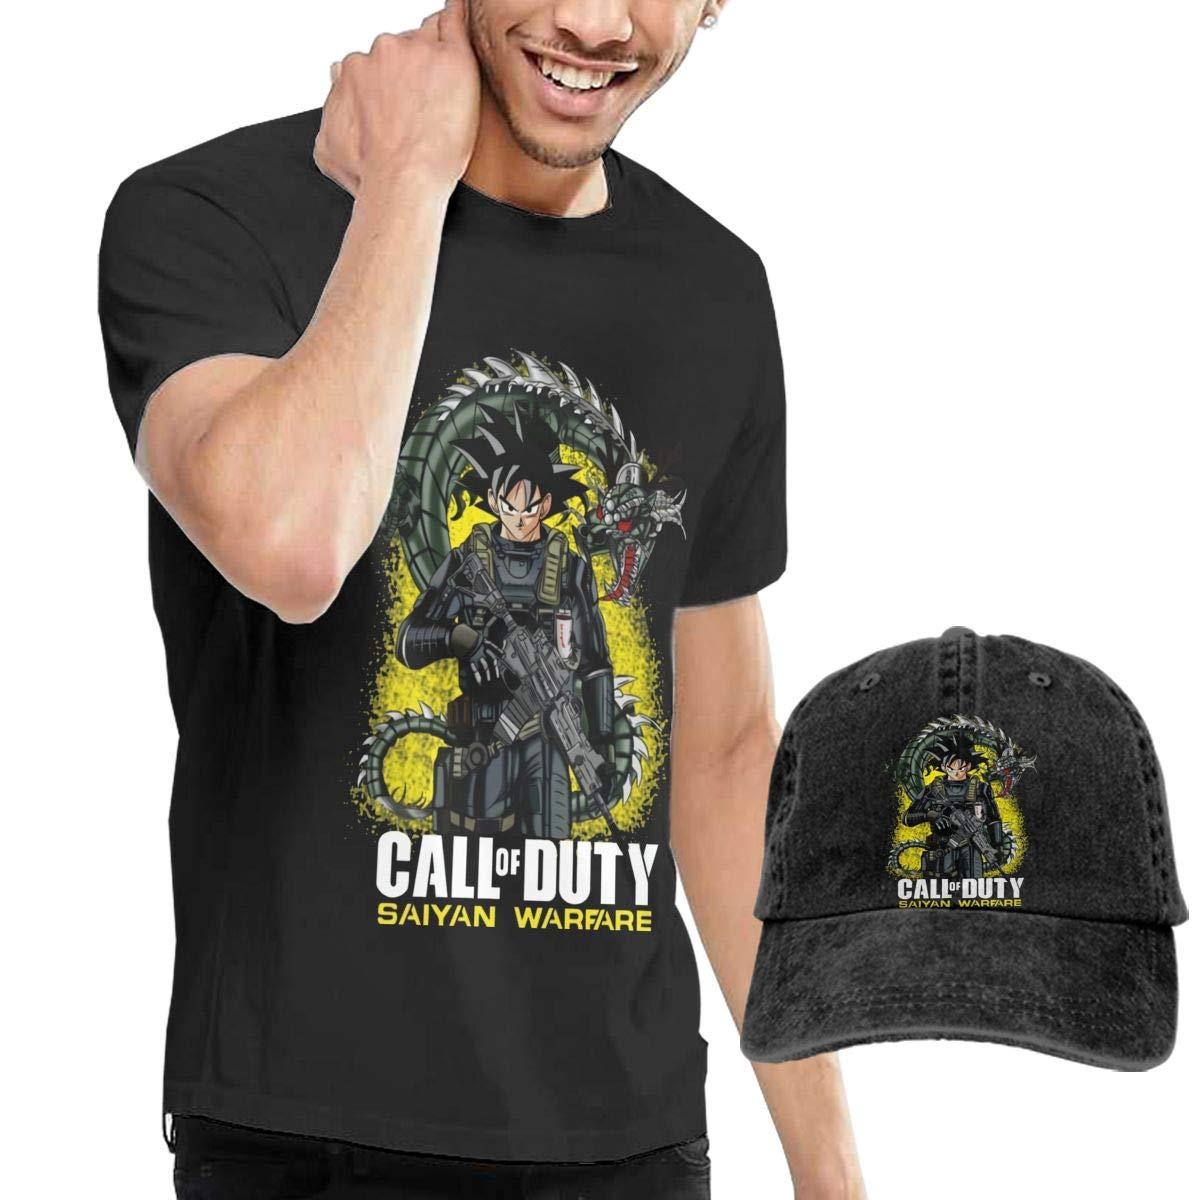 Hfusih.fhs6f789 Funny Goku /& Vegeta Adult Cap Adjustable Cowboys Hats Baseball Cap S Black